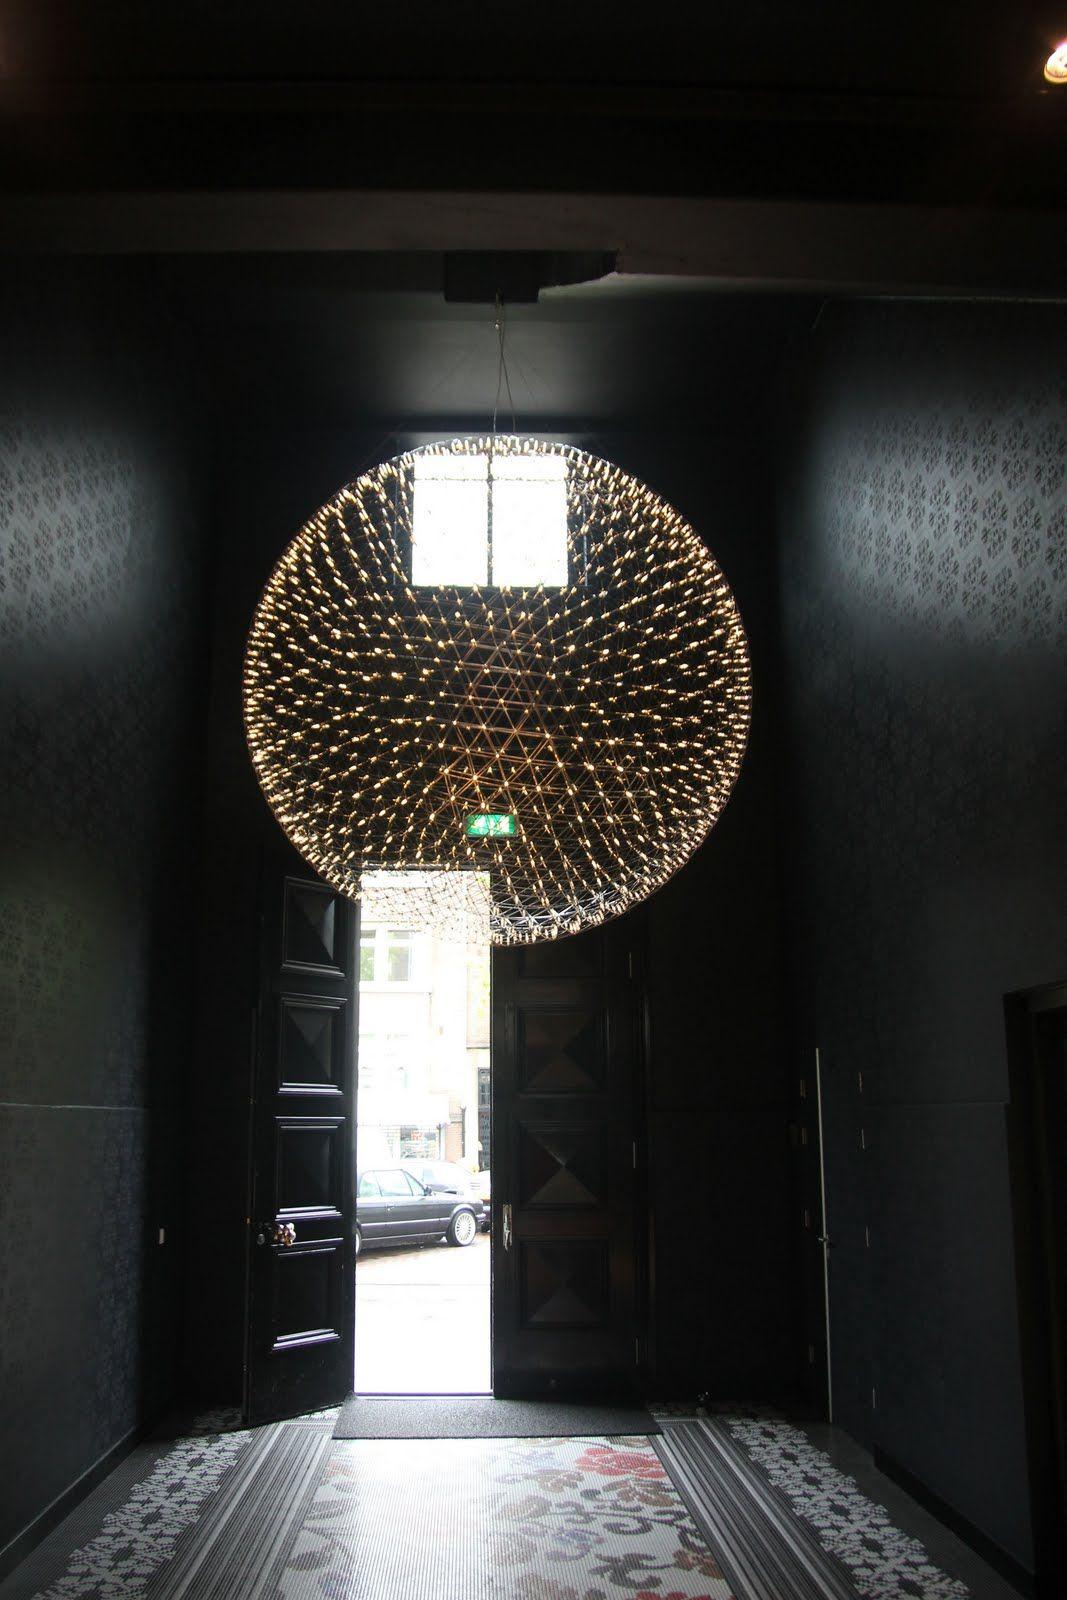 isolina-mallon-interiors-entry-lights-moooi